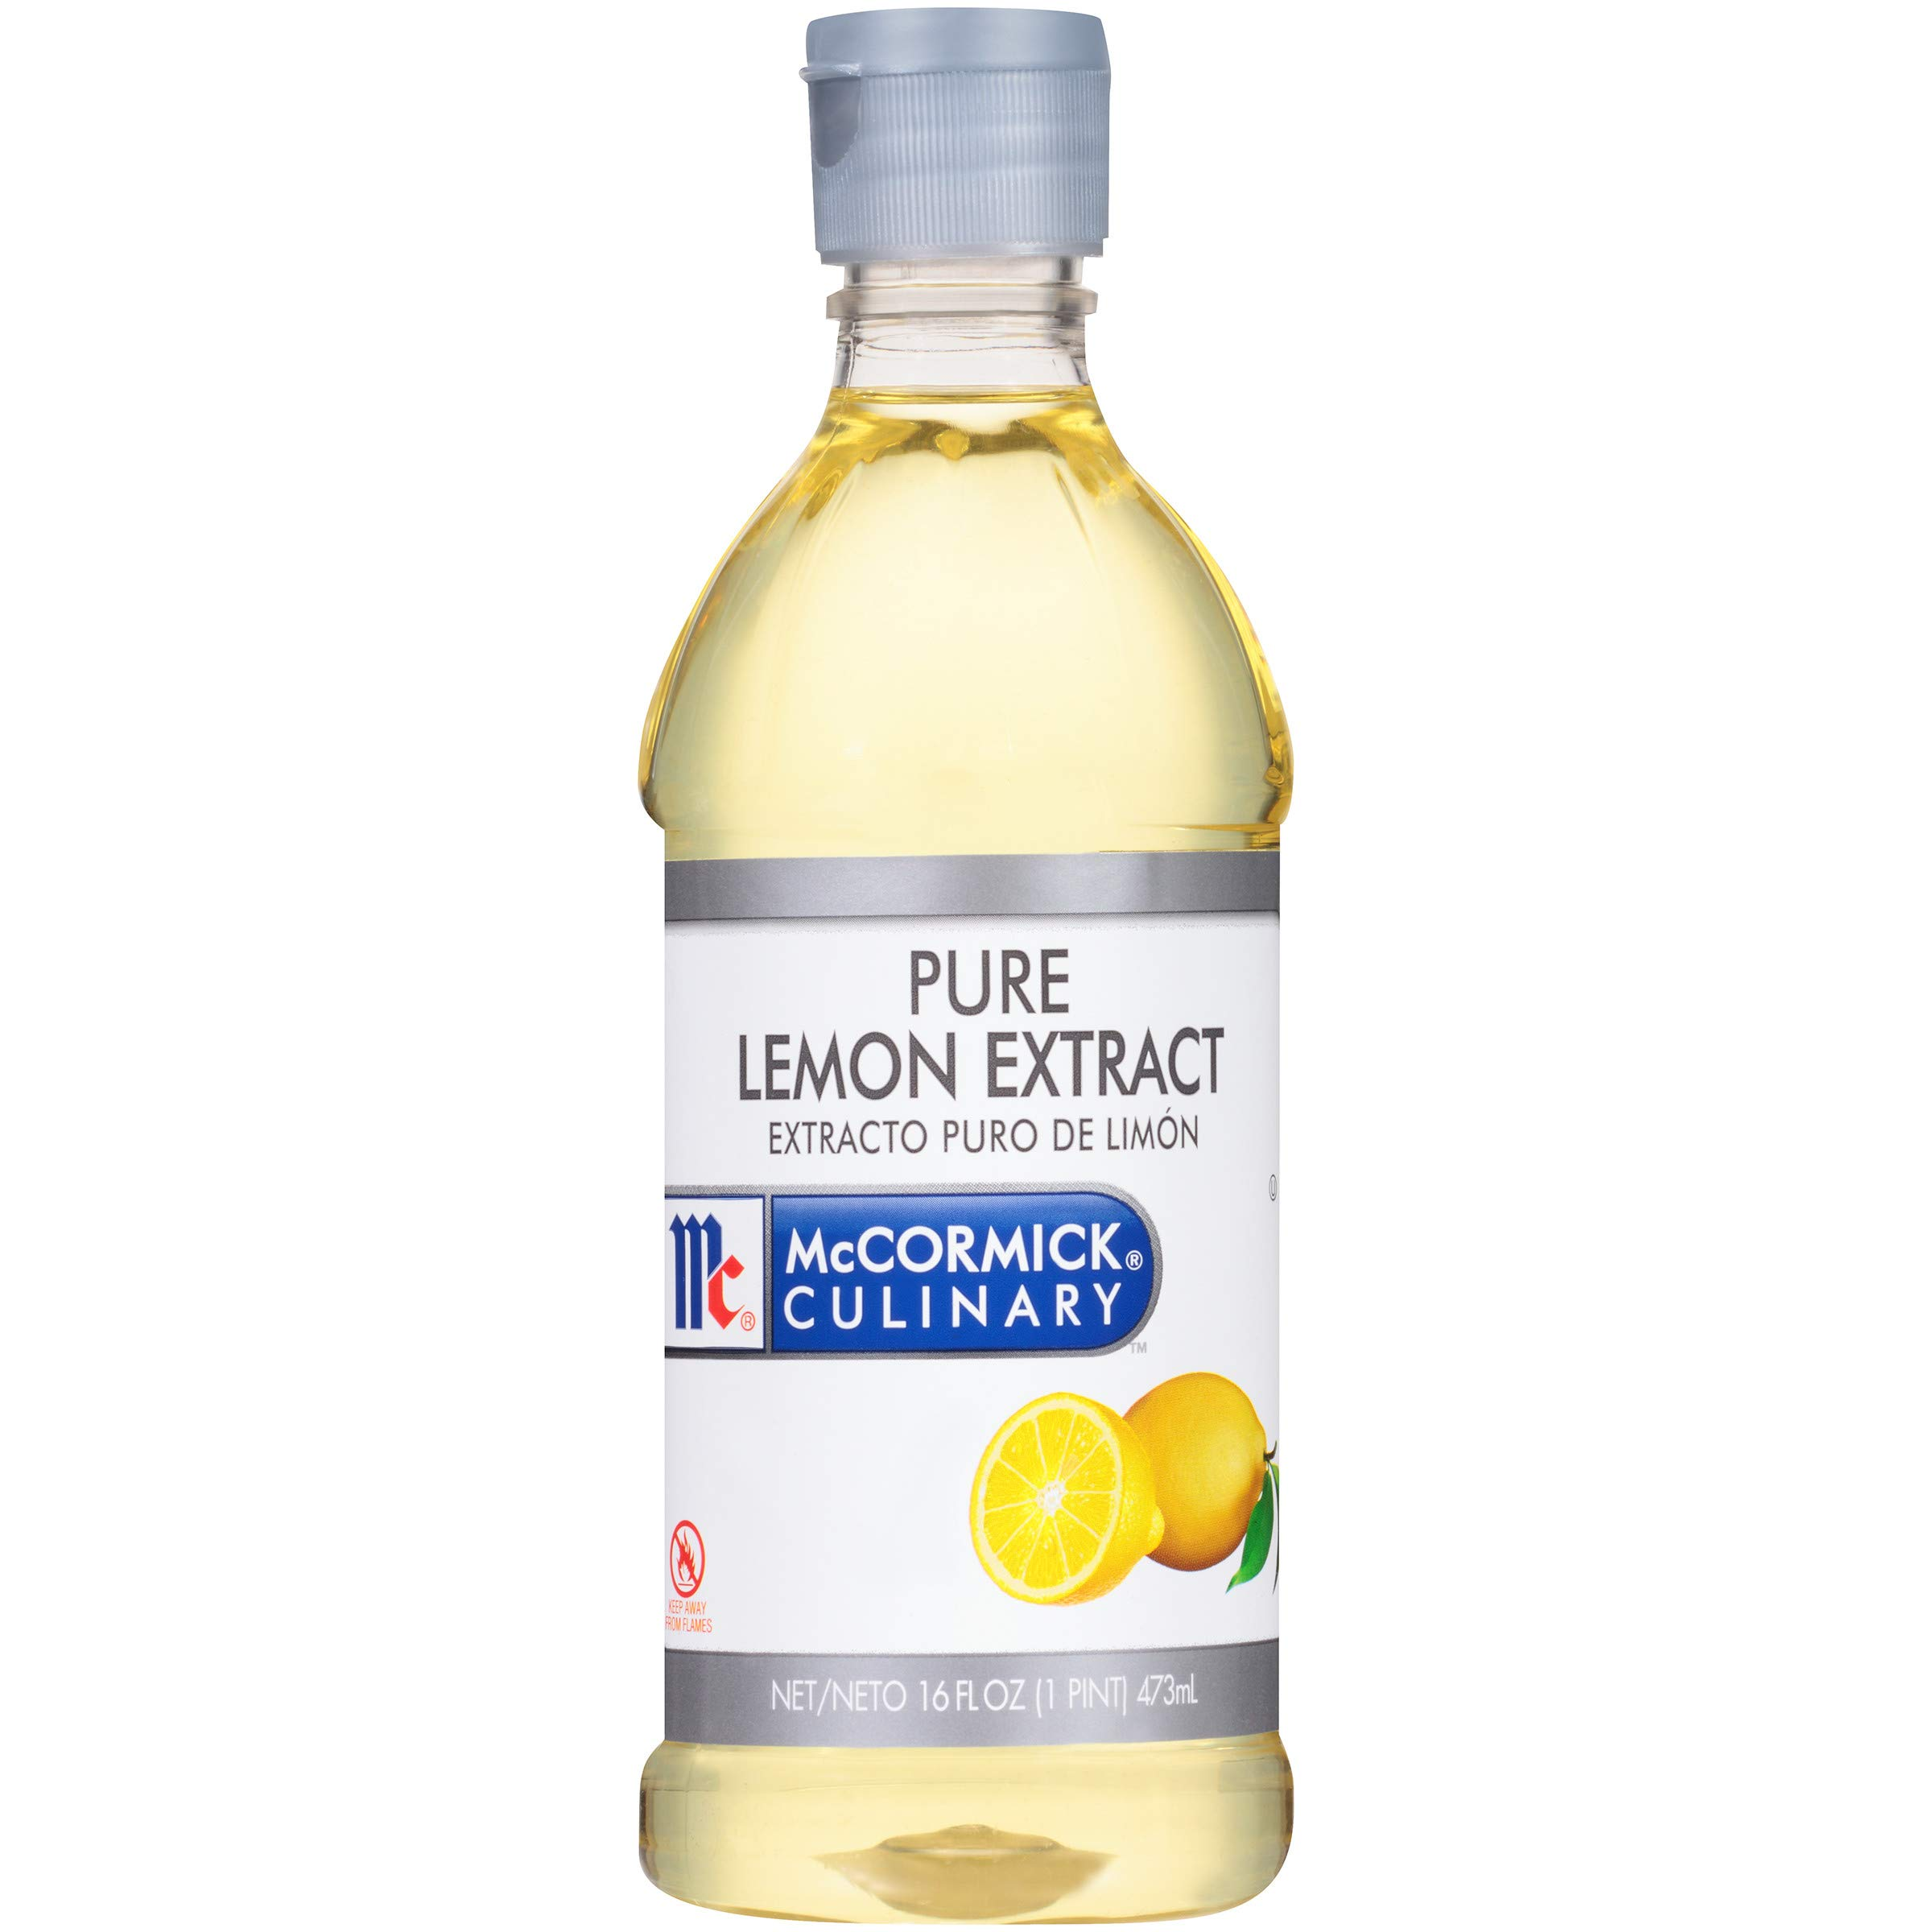 McCormick Culinary Pure Lemon Extract, 16 fl oz